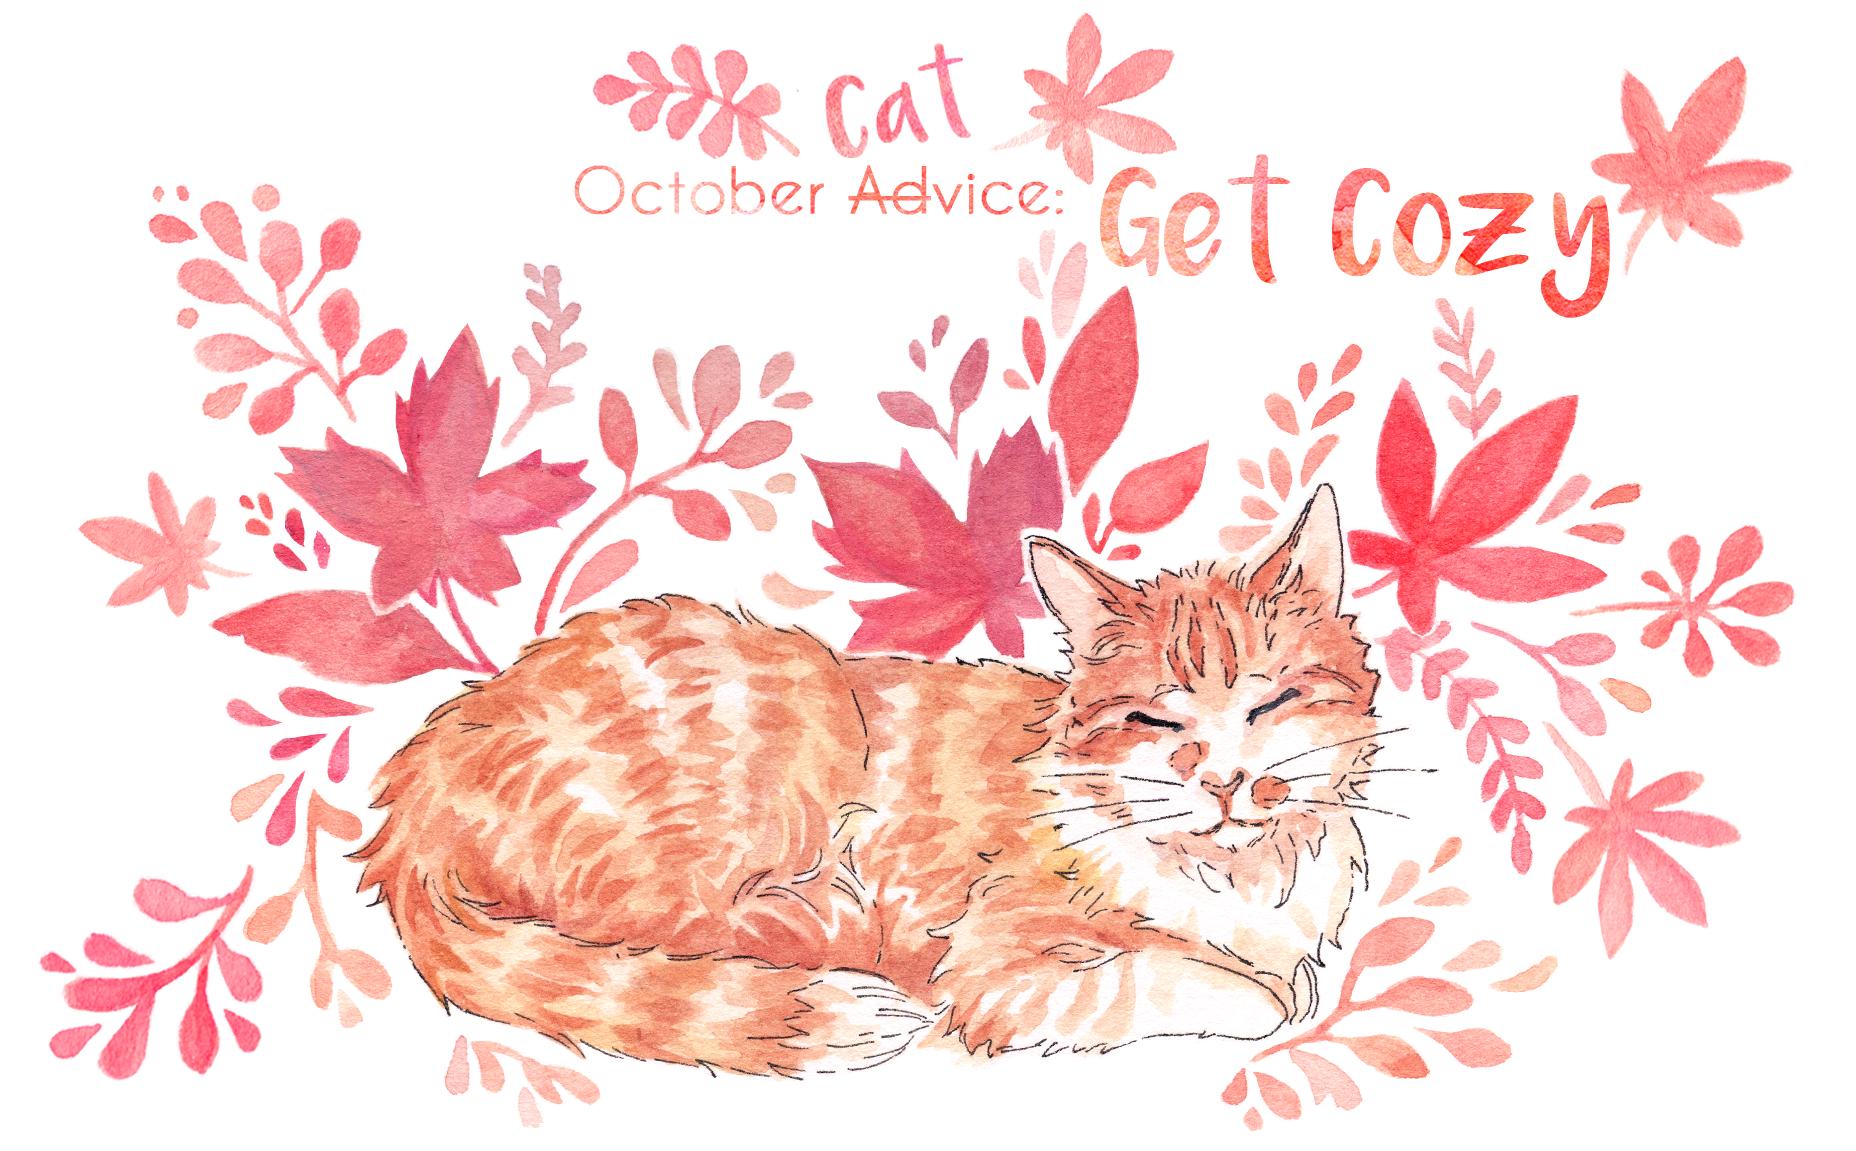 get-cozy-october-catadvice.PNG